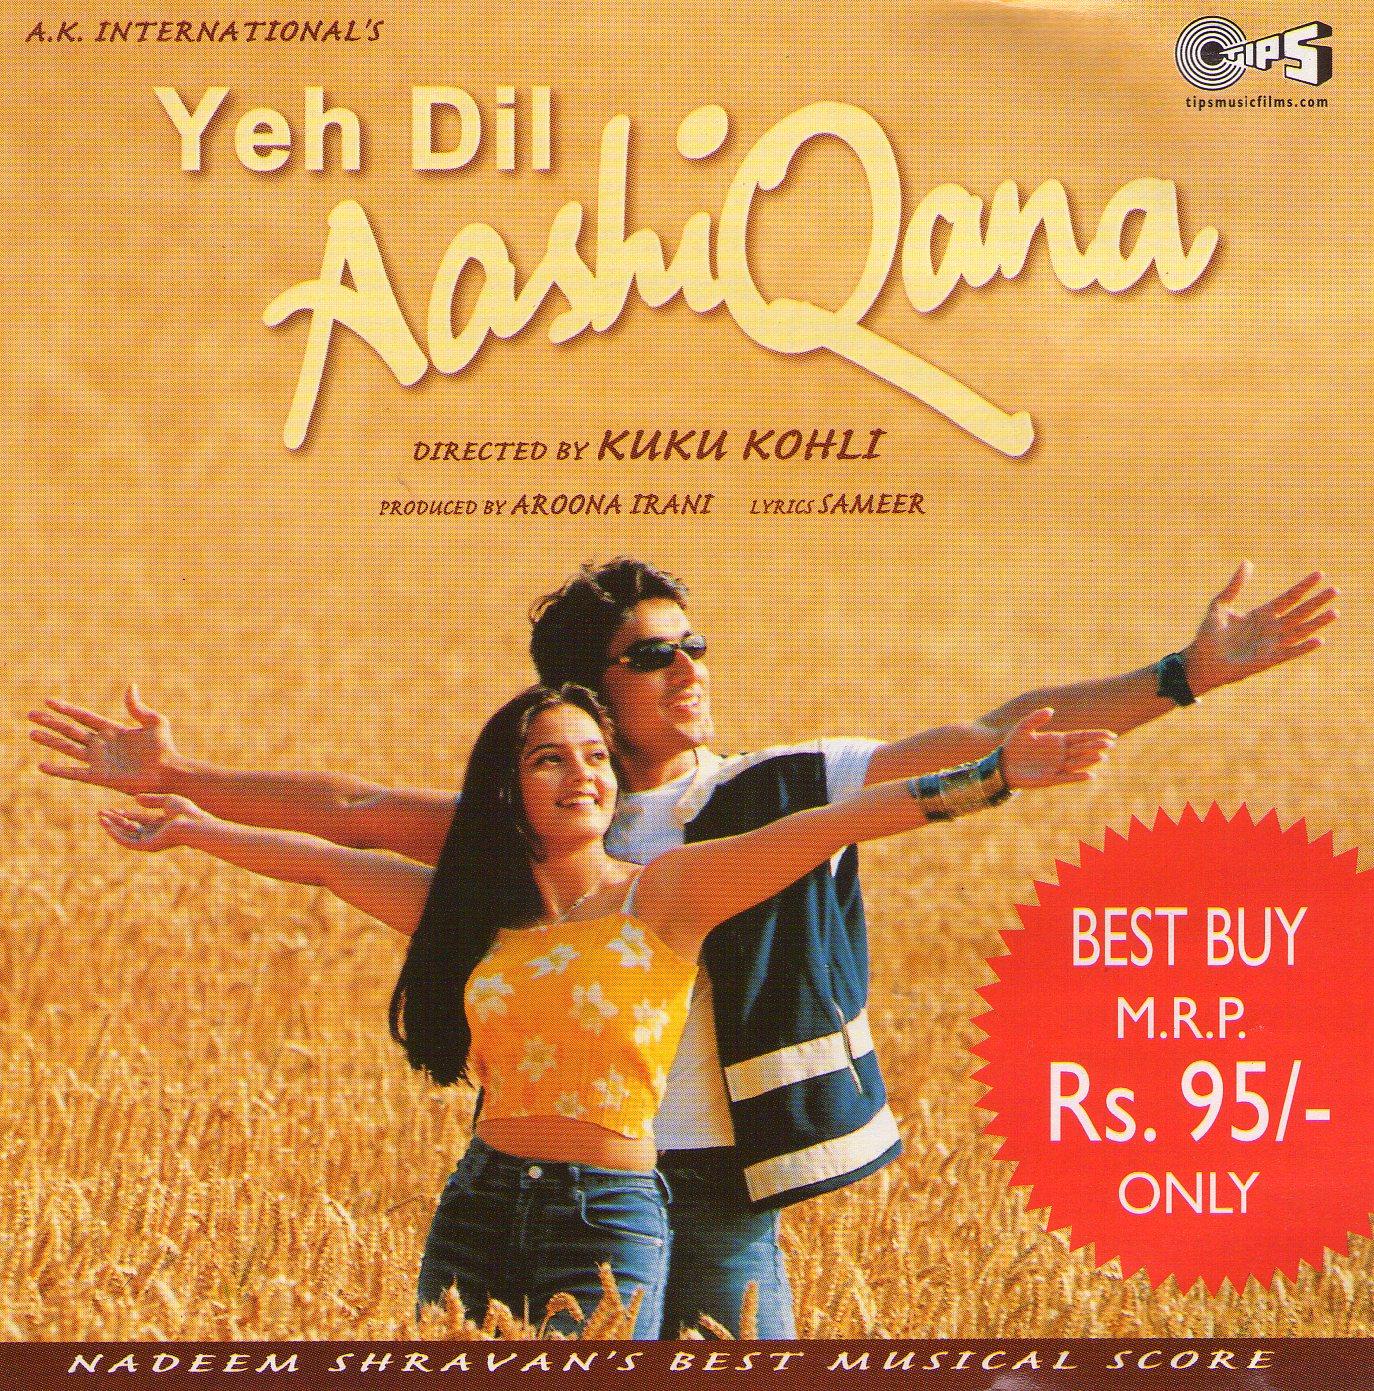 Yeh Dil Aashiqana (Remix) Song Download Shaan - DjBaap.com